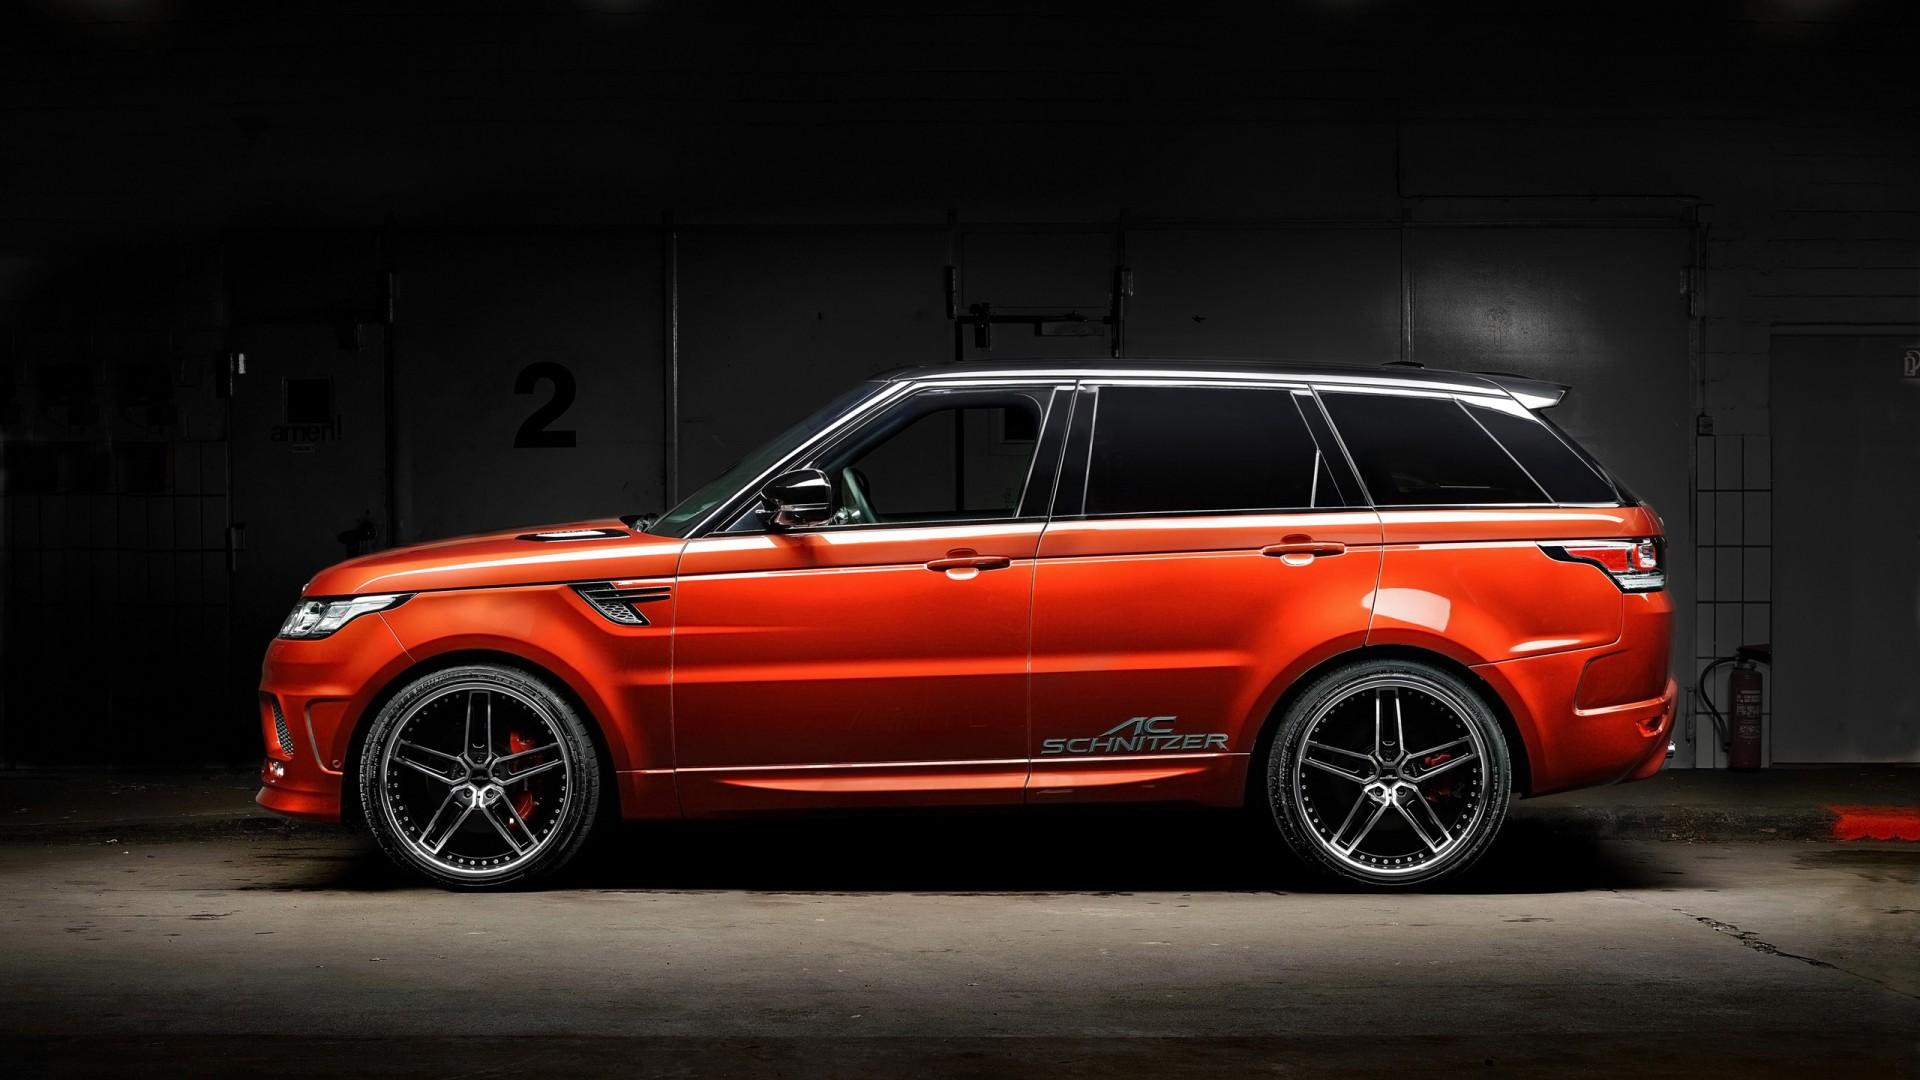 Range Rover Sport Wallpaper For Iphone >> 2014 Range Rover Sport By AC Schnitzer Wallpaper | HD Car Wallpapers | ID #4232